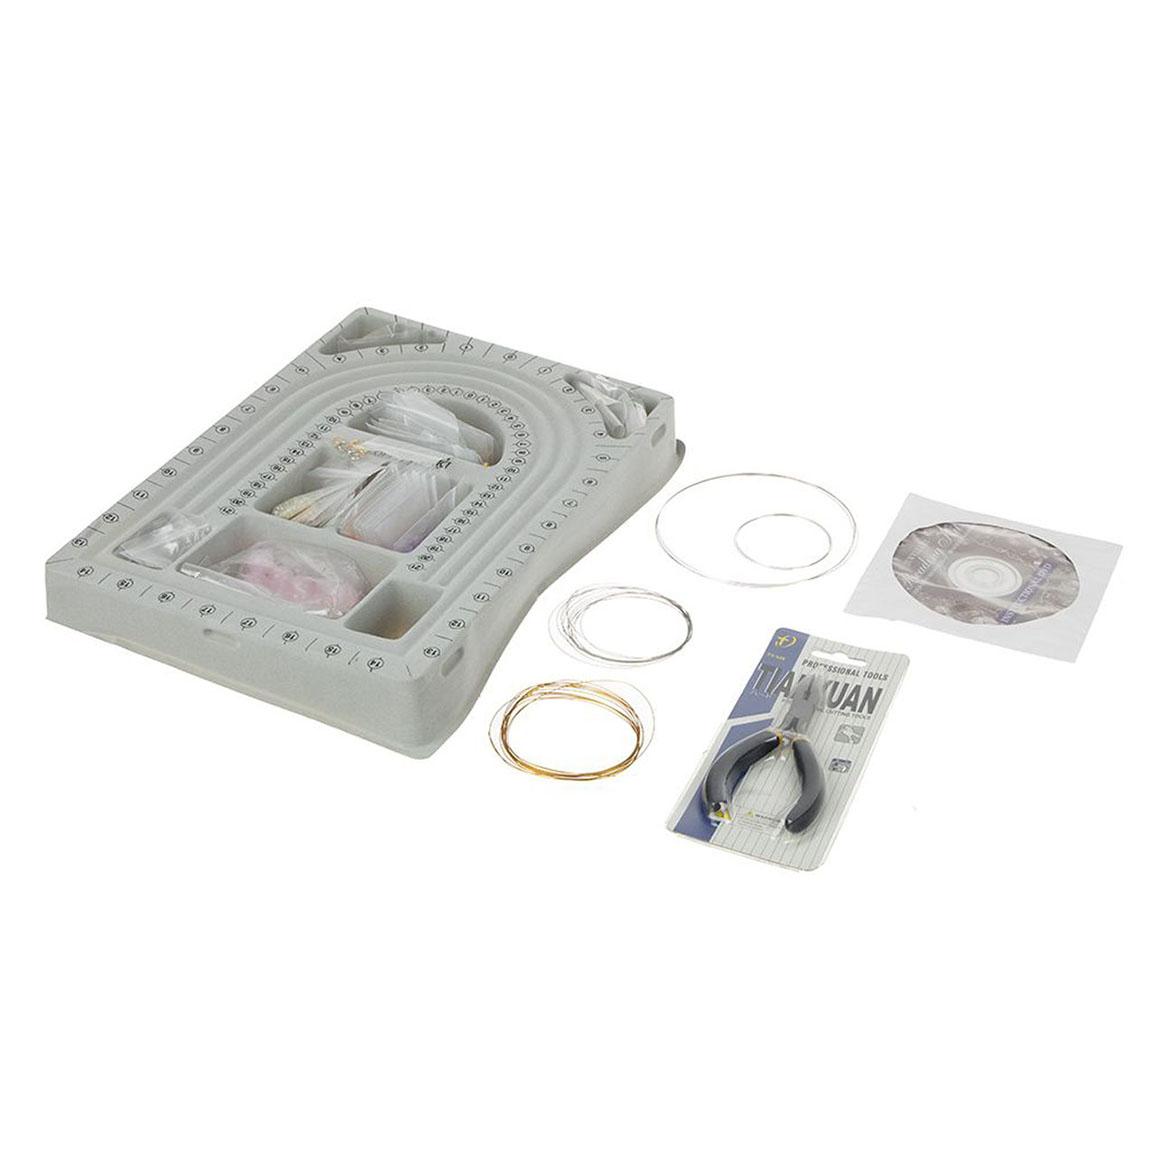 مجموعه ساخت زیورآلات کد 002